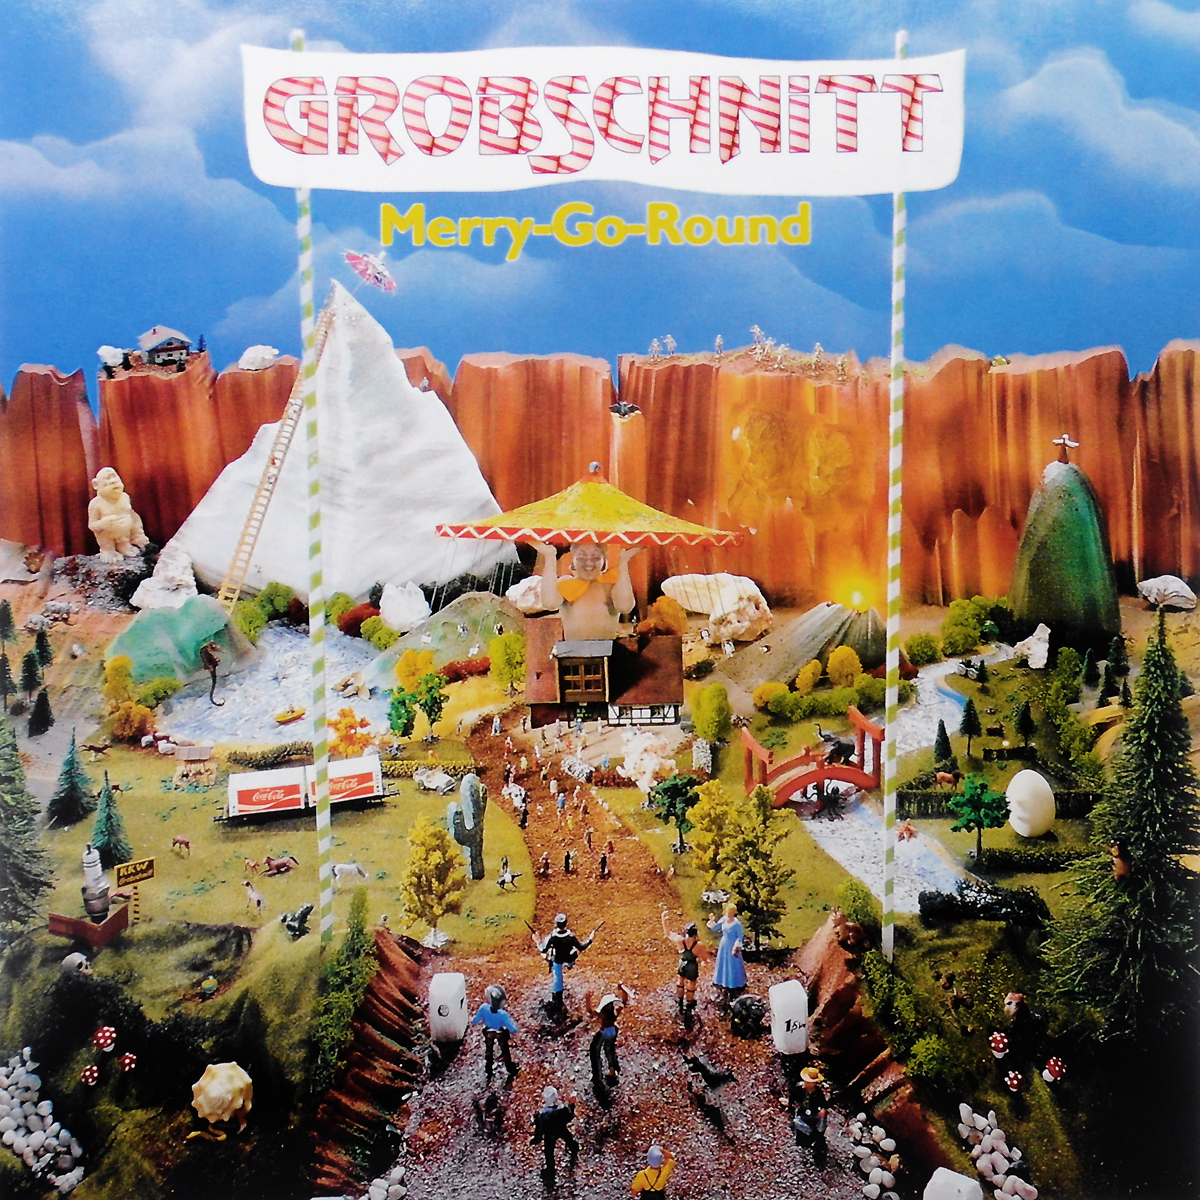 Grobschnitt Grobschnitt. Merry-Go-Round (2 LP) grobschnitt grobschnitt volle molle